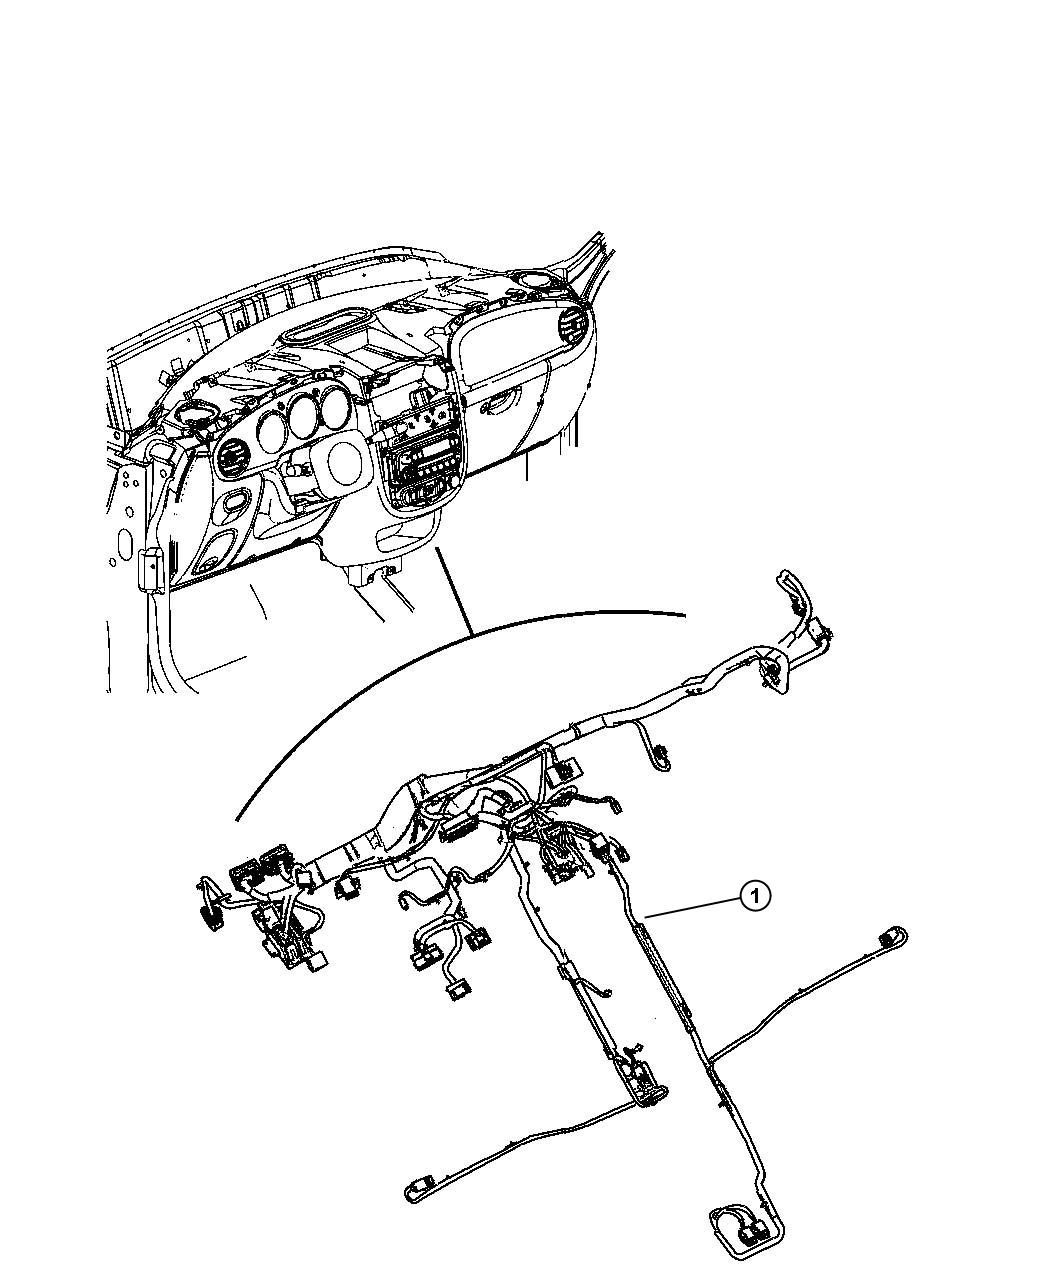 2006 Chrysler PT Cruiser Wiring. Instrument panel. Spkrs